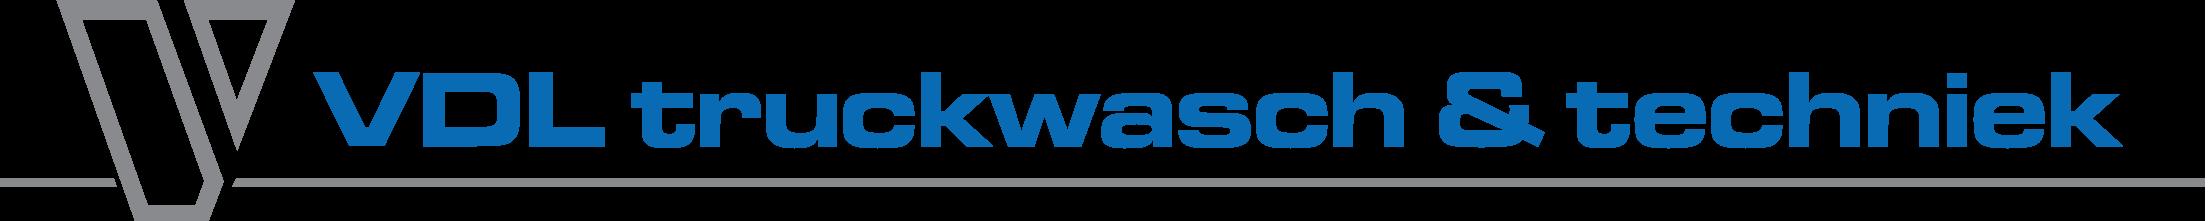 VDL Truckwash & Techniek